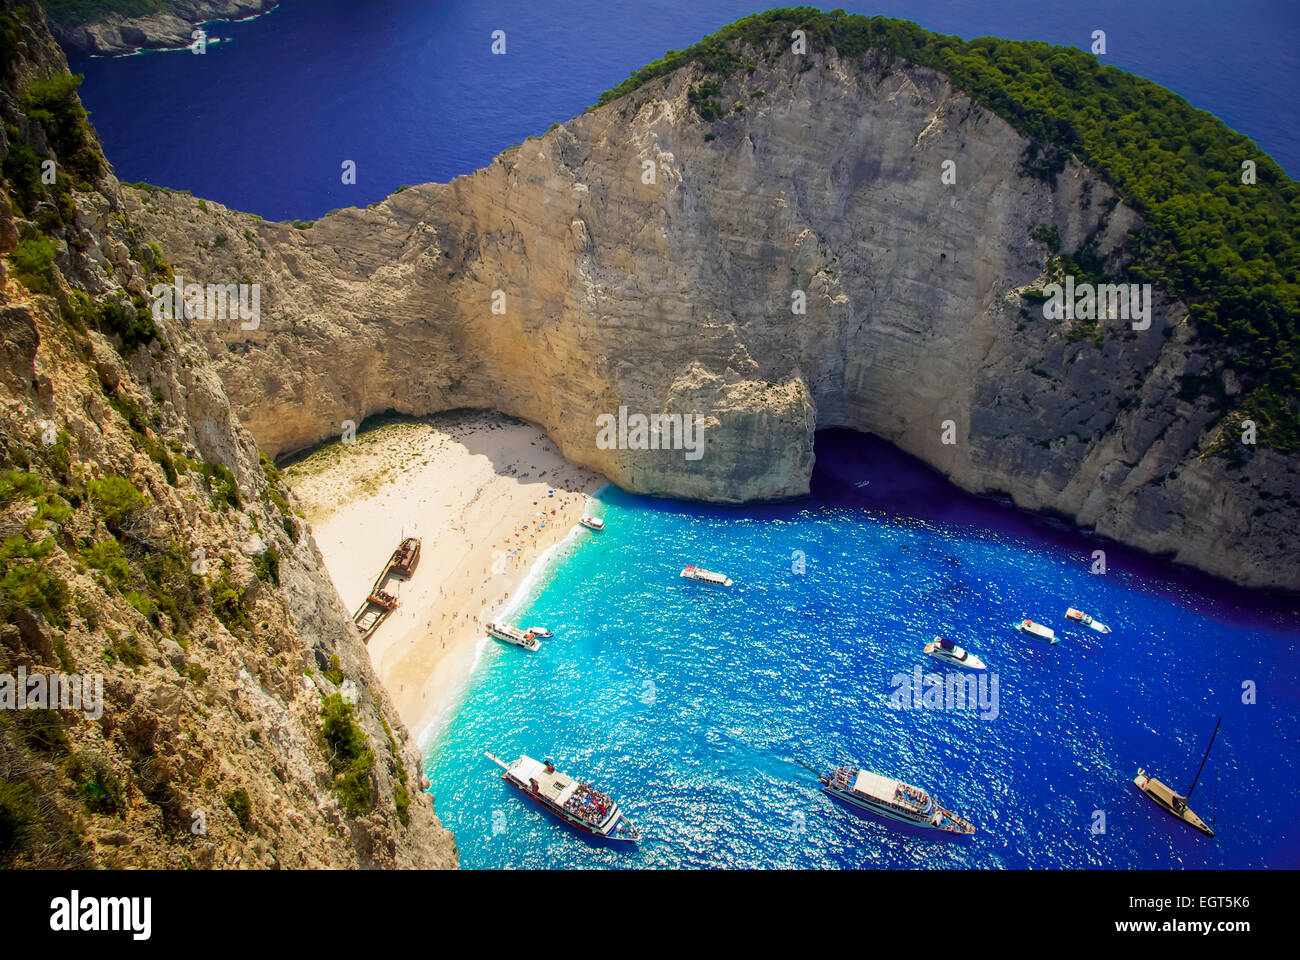 Navagio Beach - Shipwreck Beach, Zakynthos Island, Greece. The most beautiful beaches in the world. - Stock Image